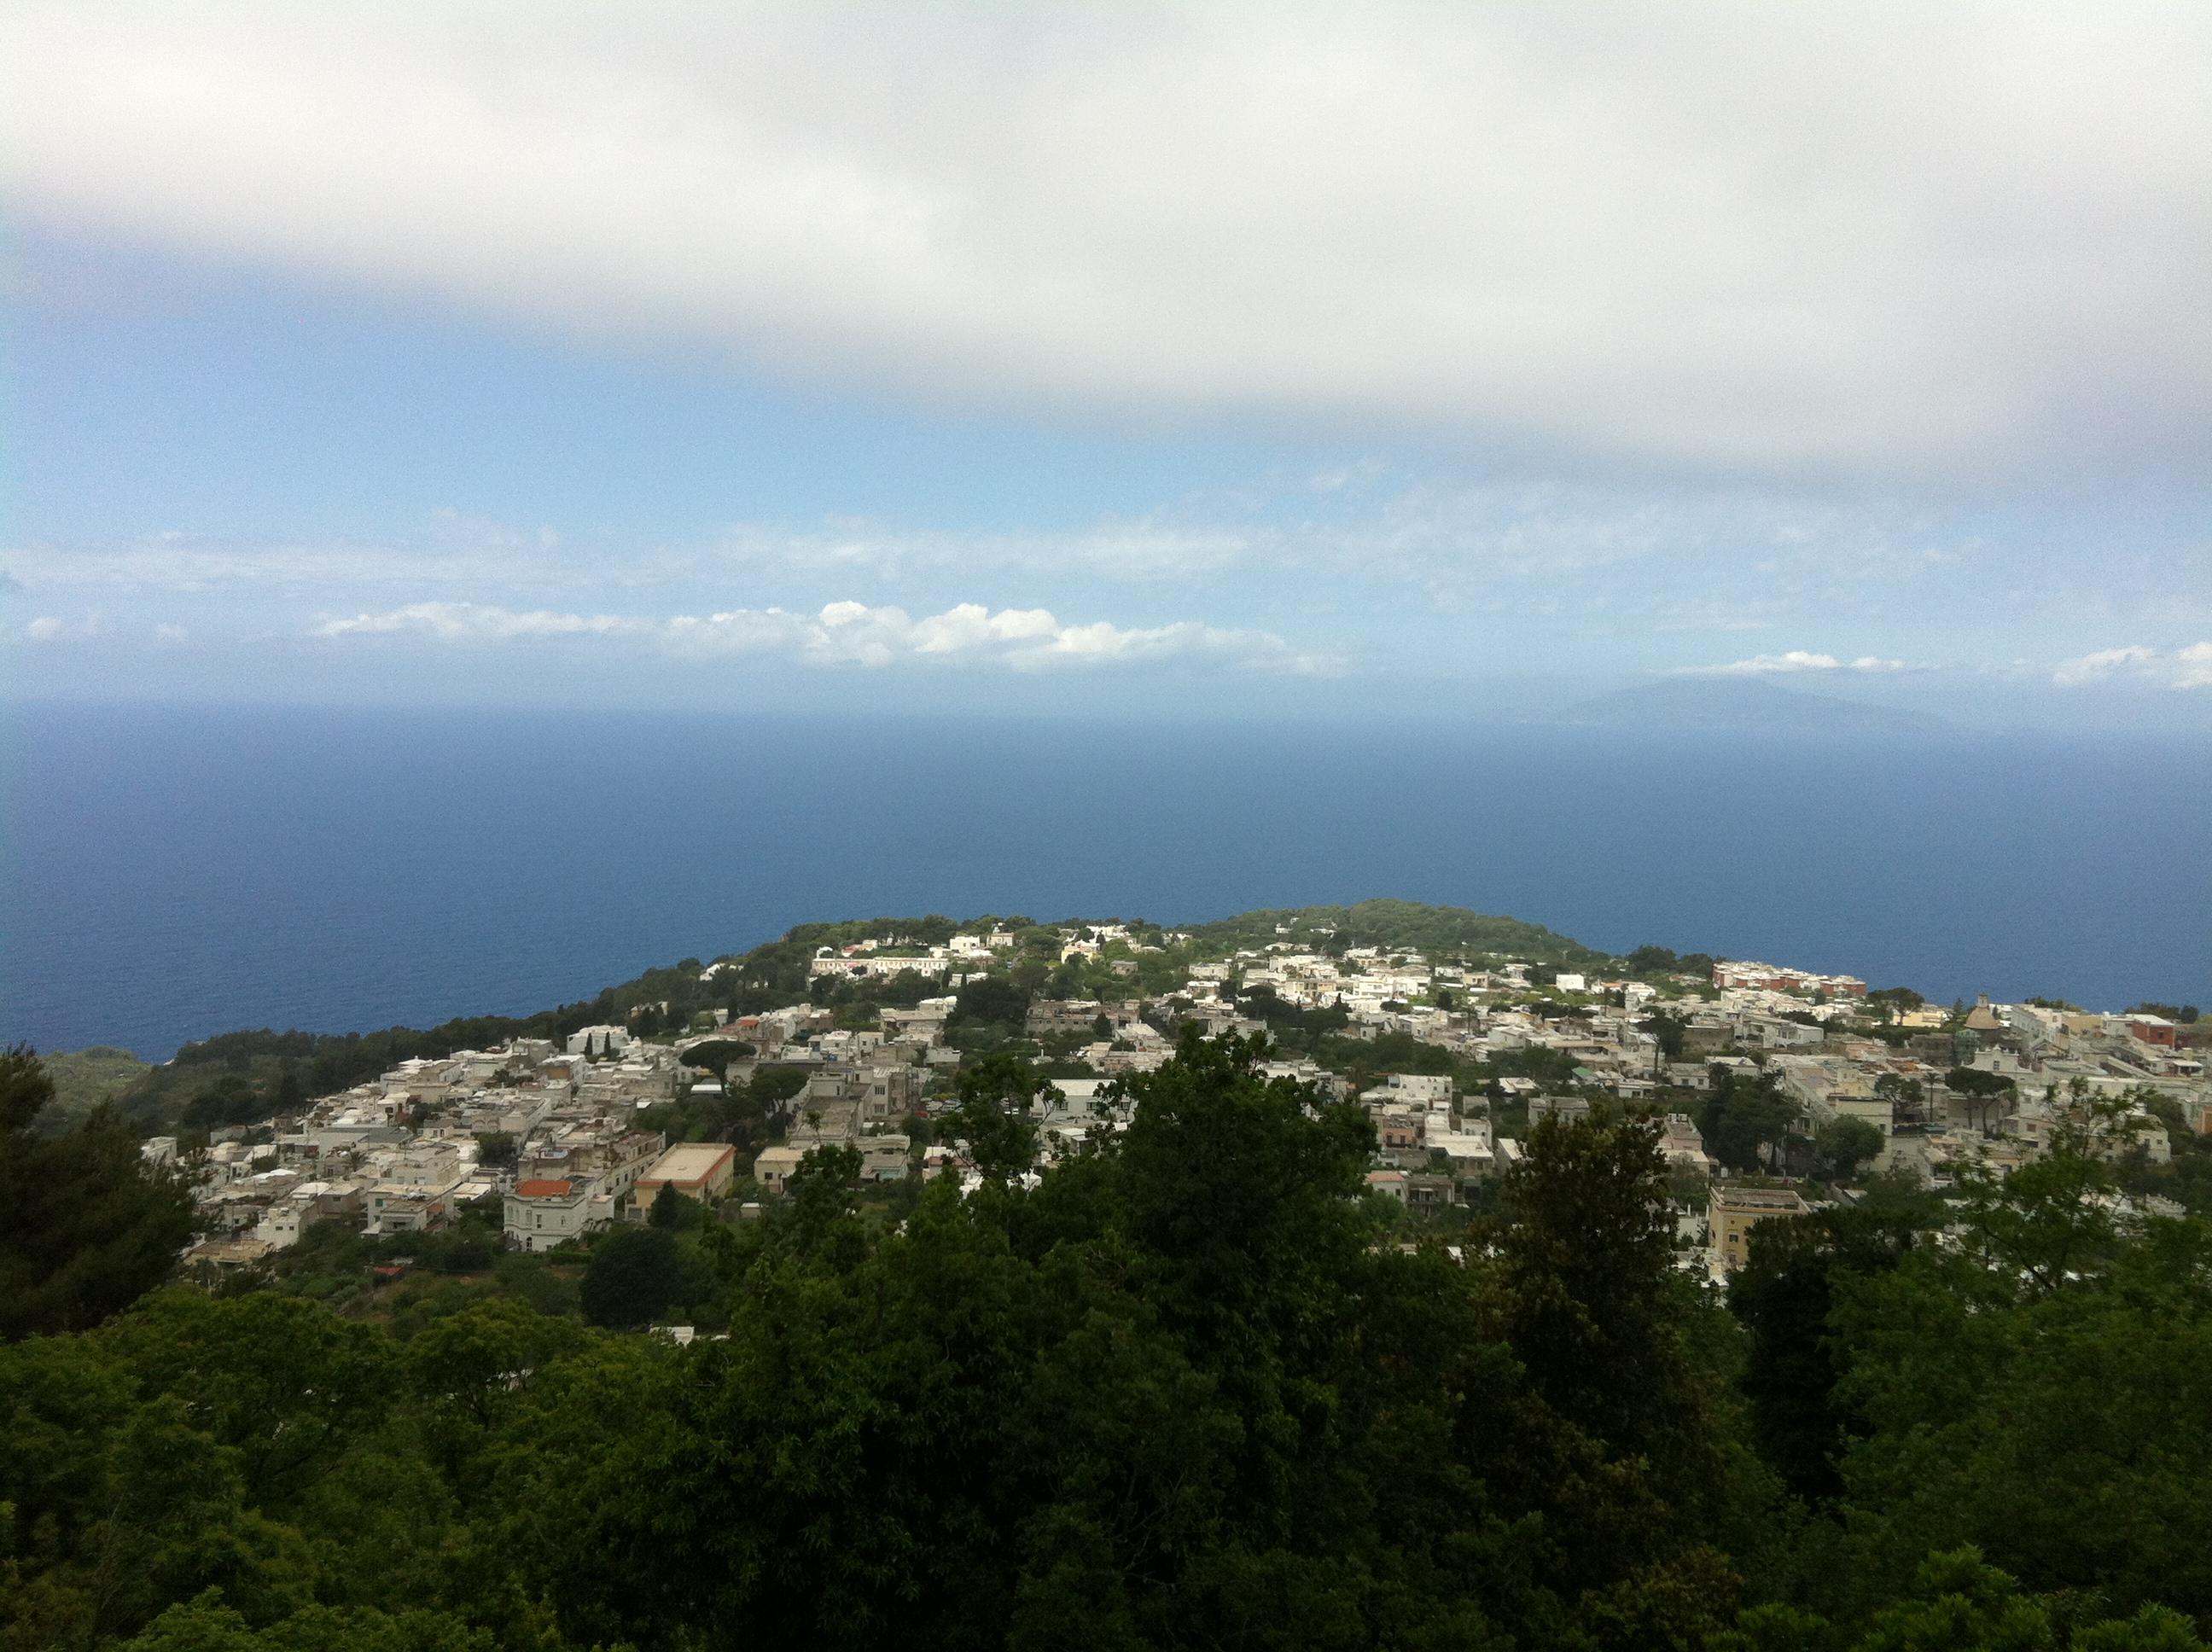 Chairlift to Capri